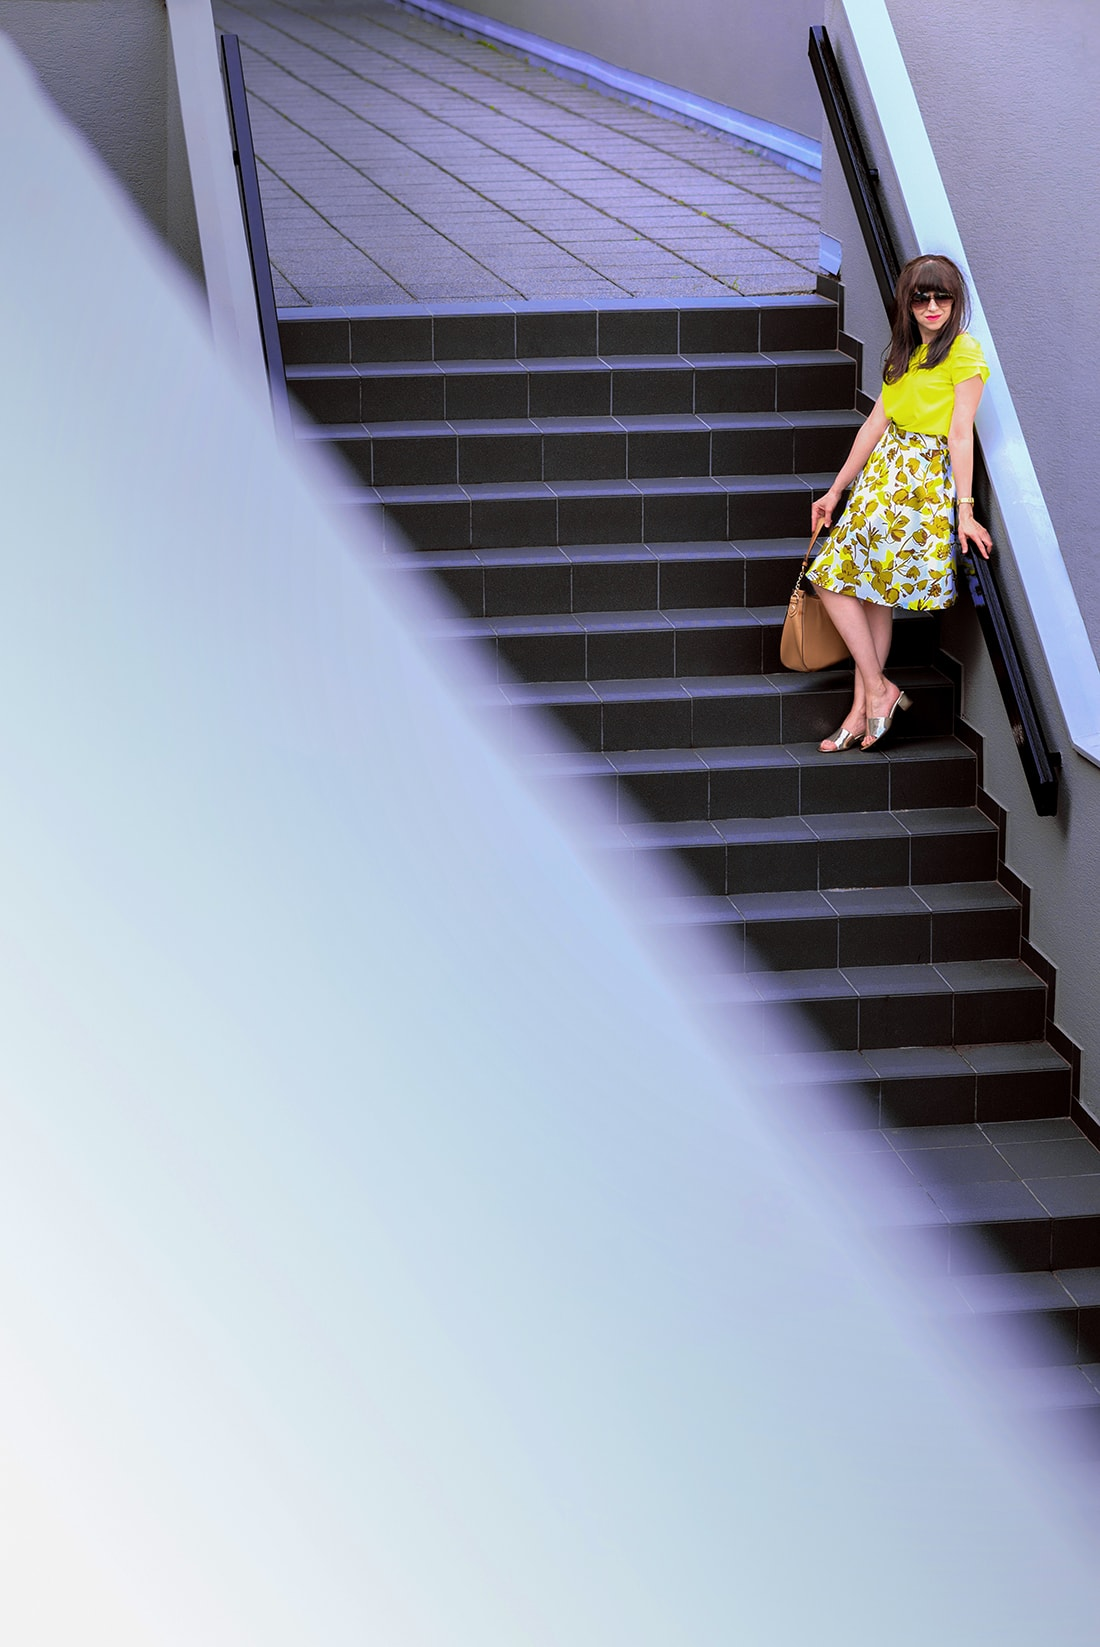 SUKŃA NA LETO OD MARGIFASHION_Katharine-fashion is beautiful_blog 3_Sukňa zelené kvety_Zlaté šľapky Sagan_Katarína Jakubčová_Fashion blogger